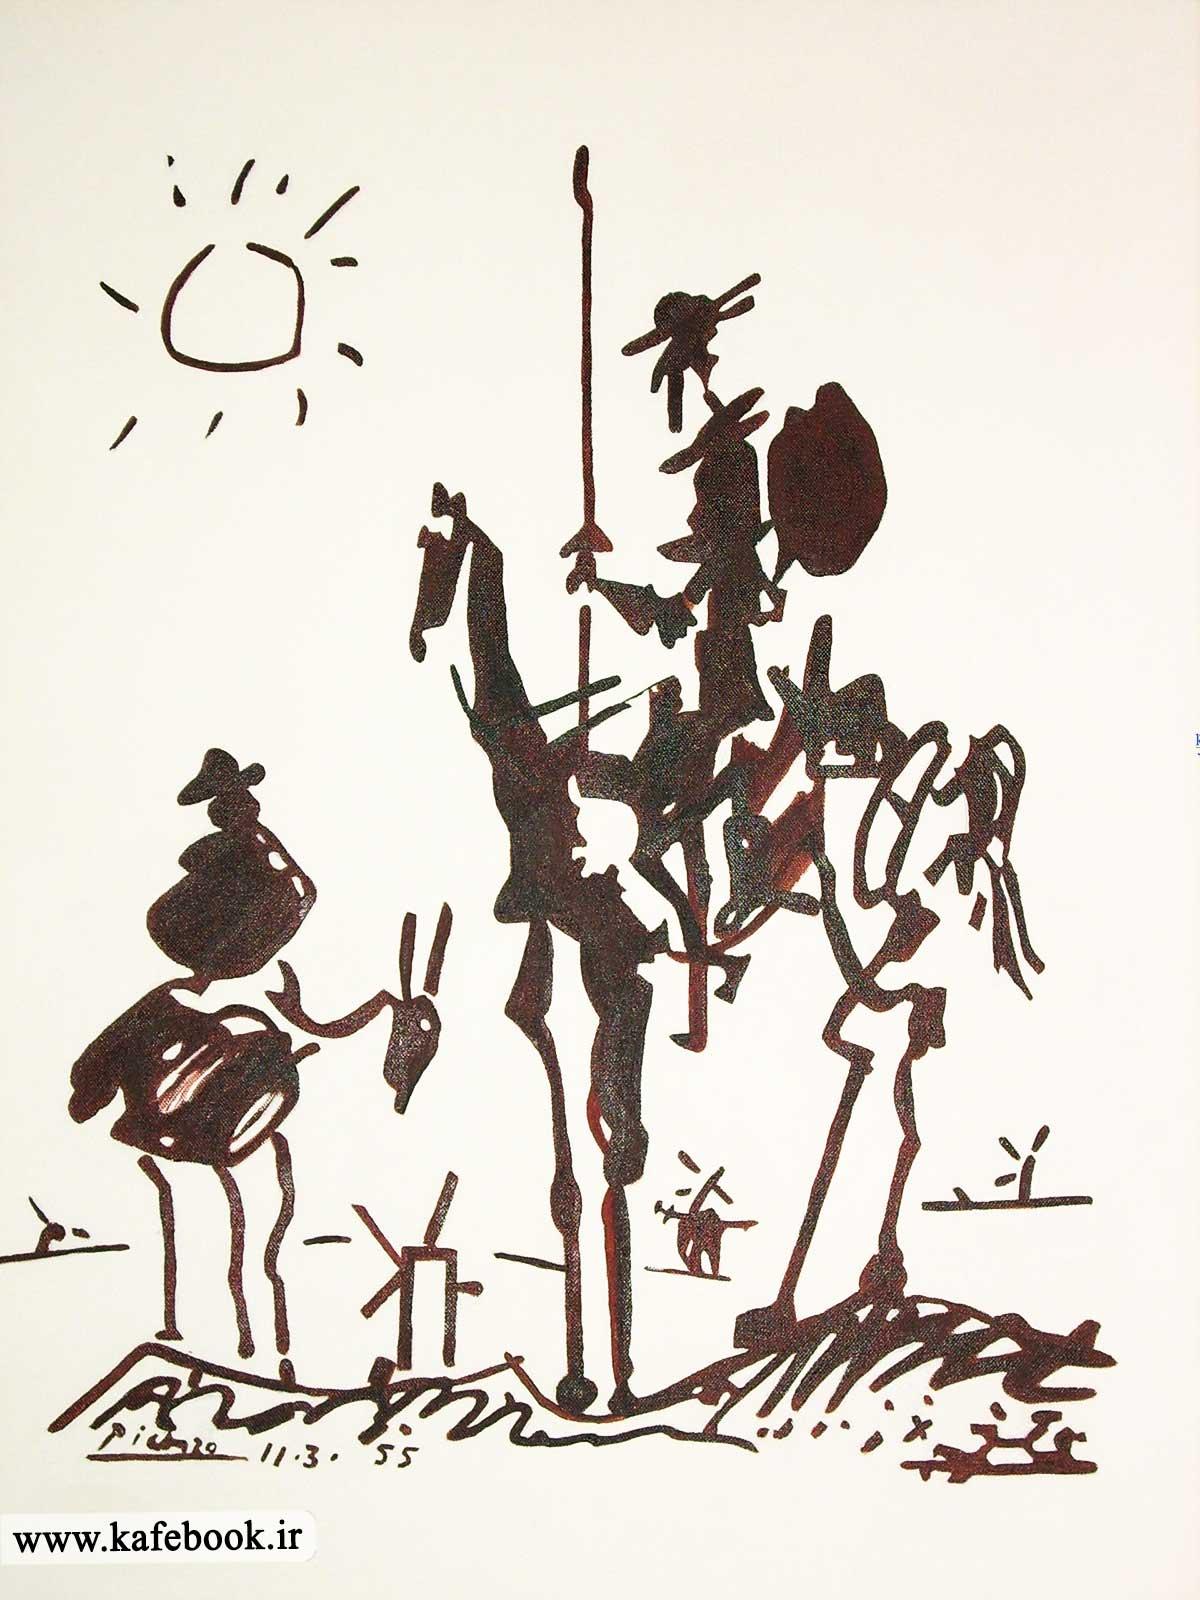 نقاشی دن کیشوت اثر پیکاسو